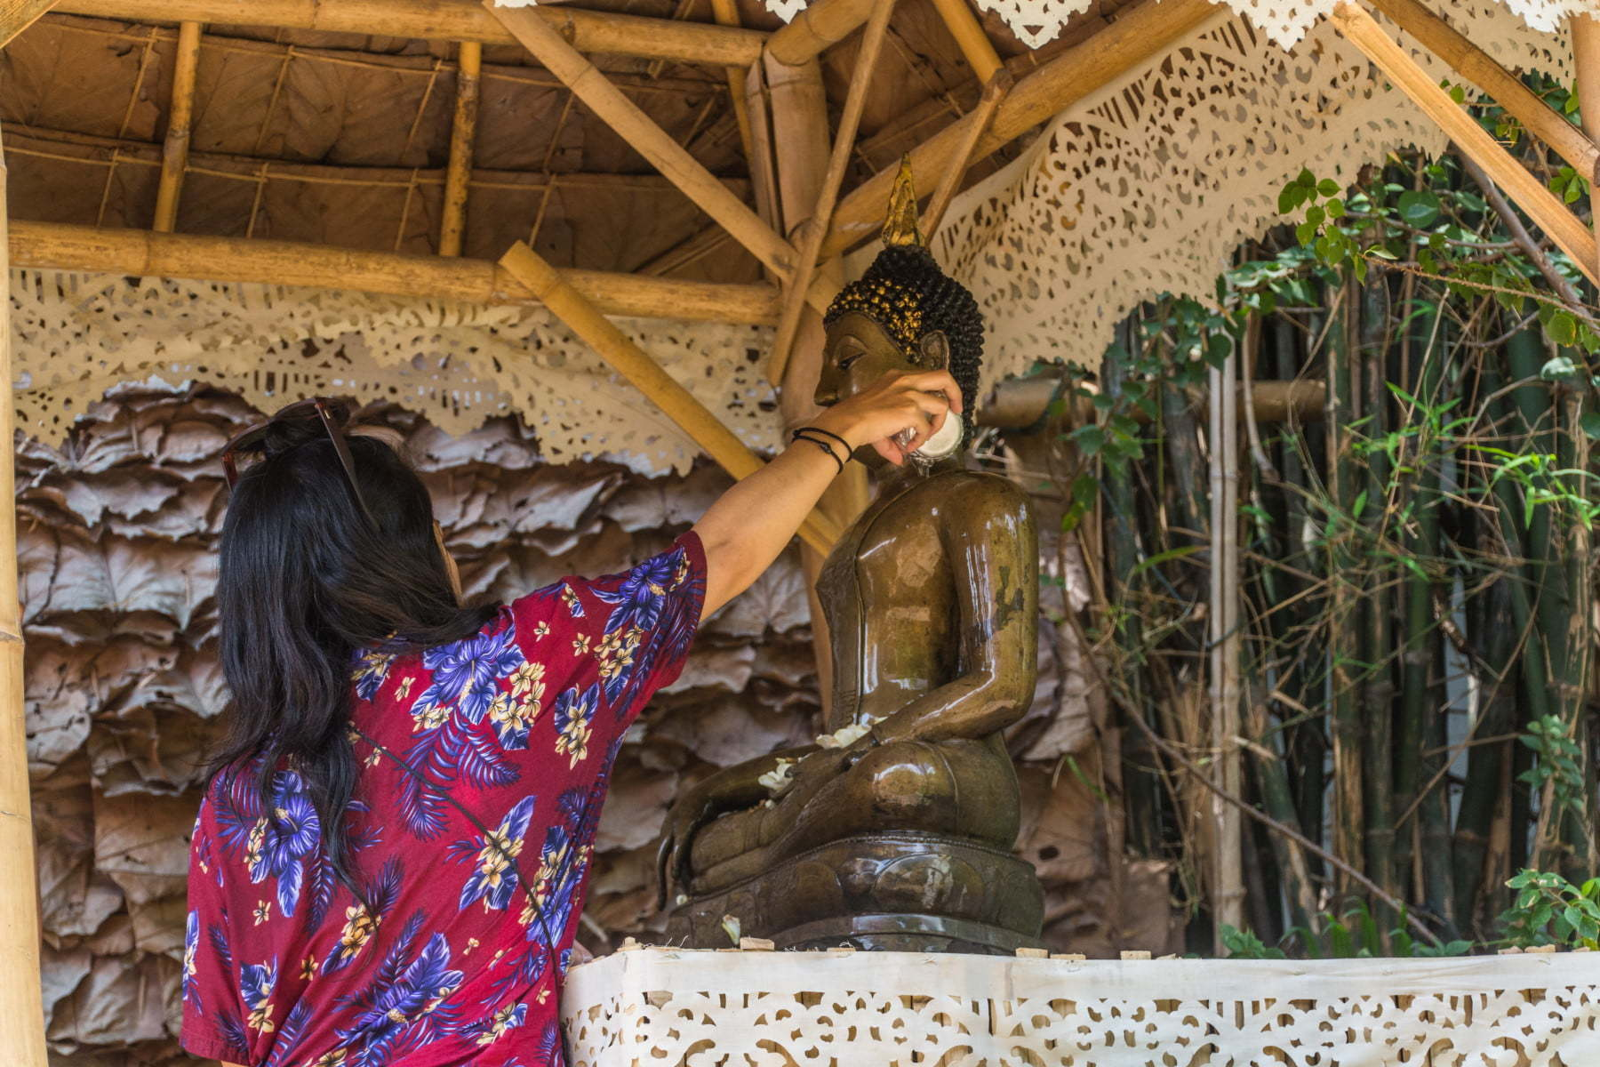 thailandaise verse eau bouddha songkran chiang mai